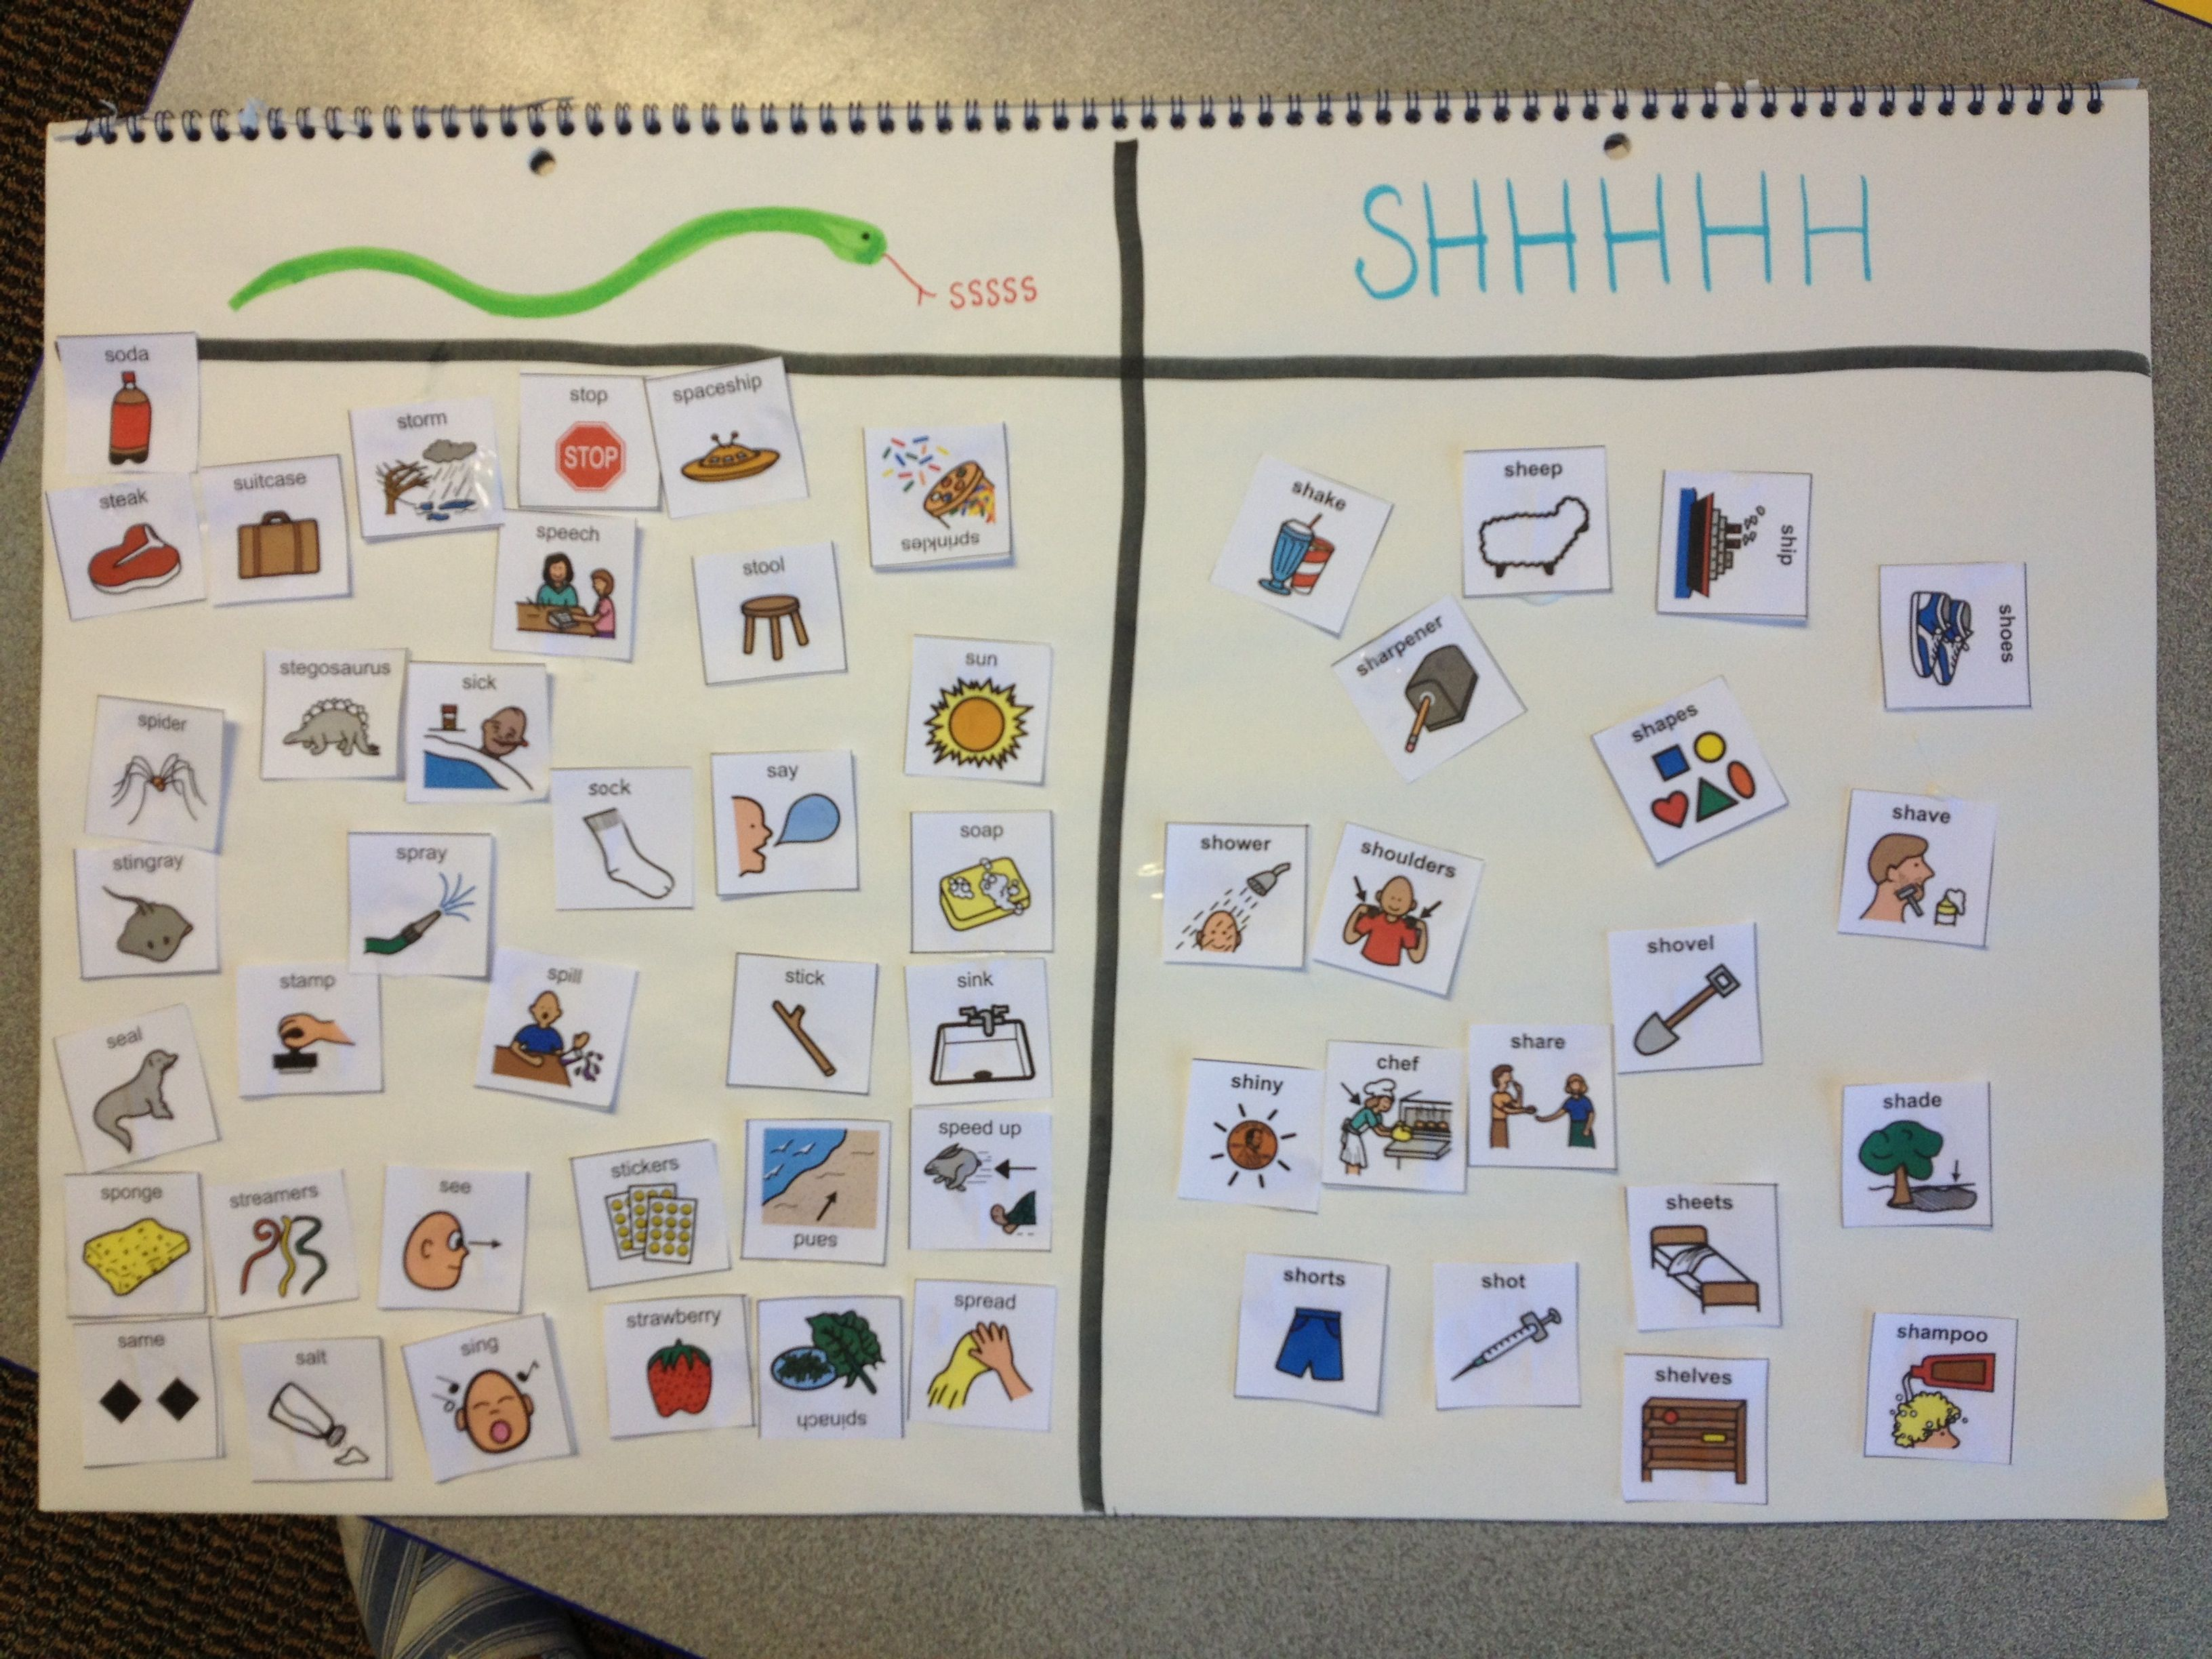 Speech Therapy Ideas S And Sh Discrimination Snake Sound Vs Shhhhhhh Sound